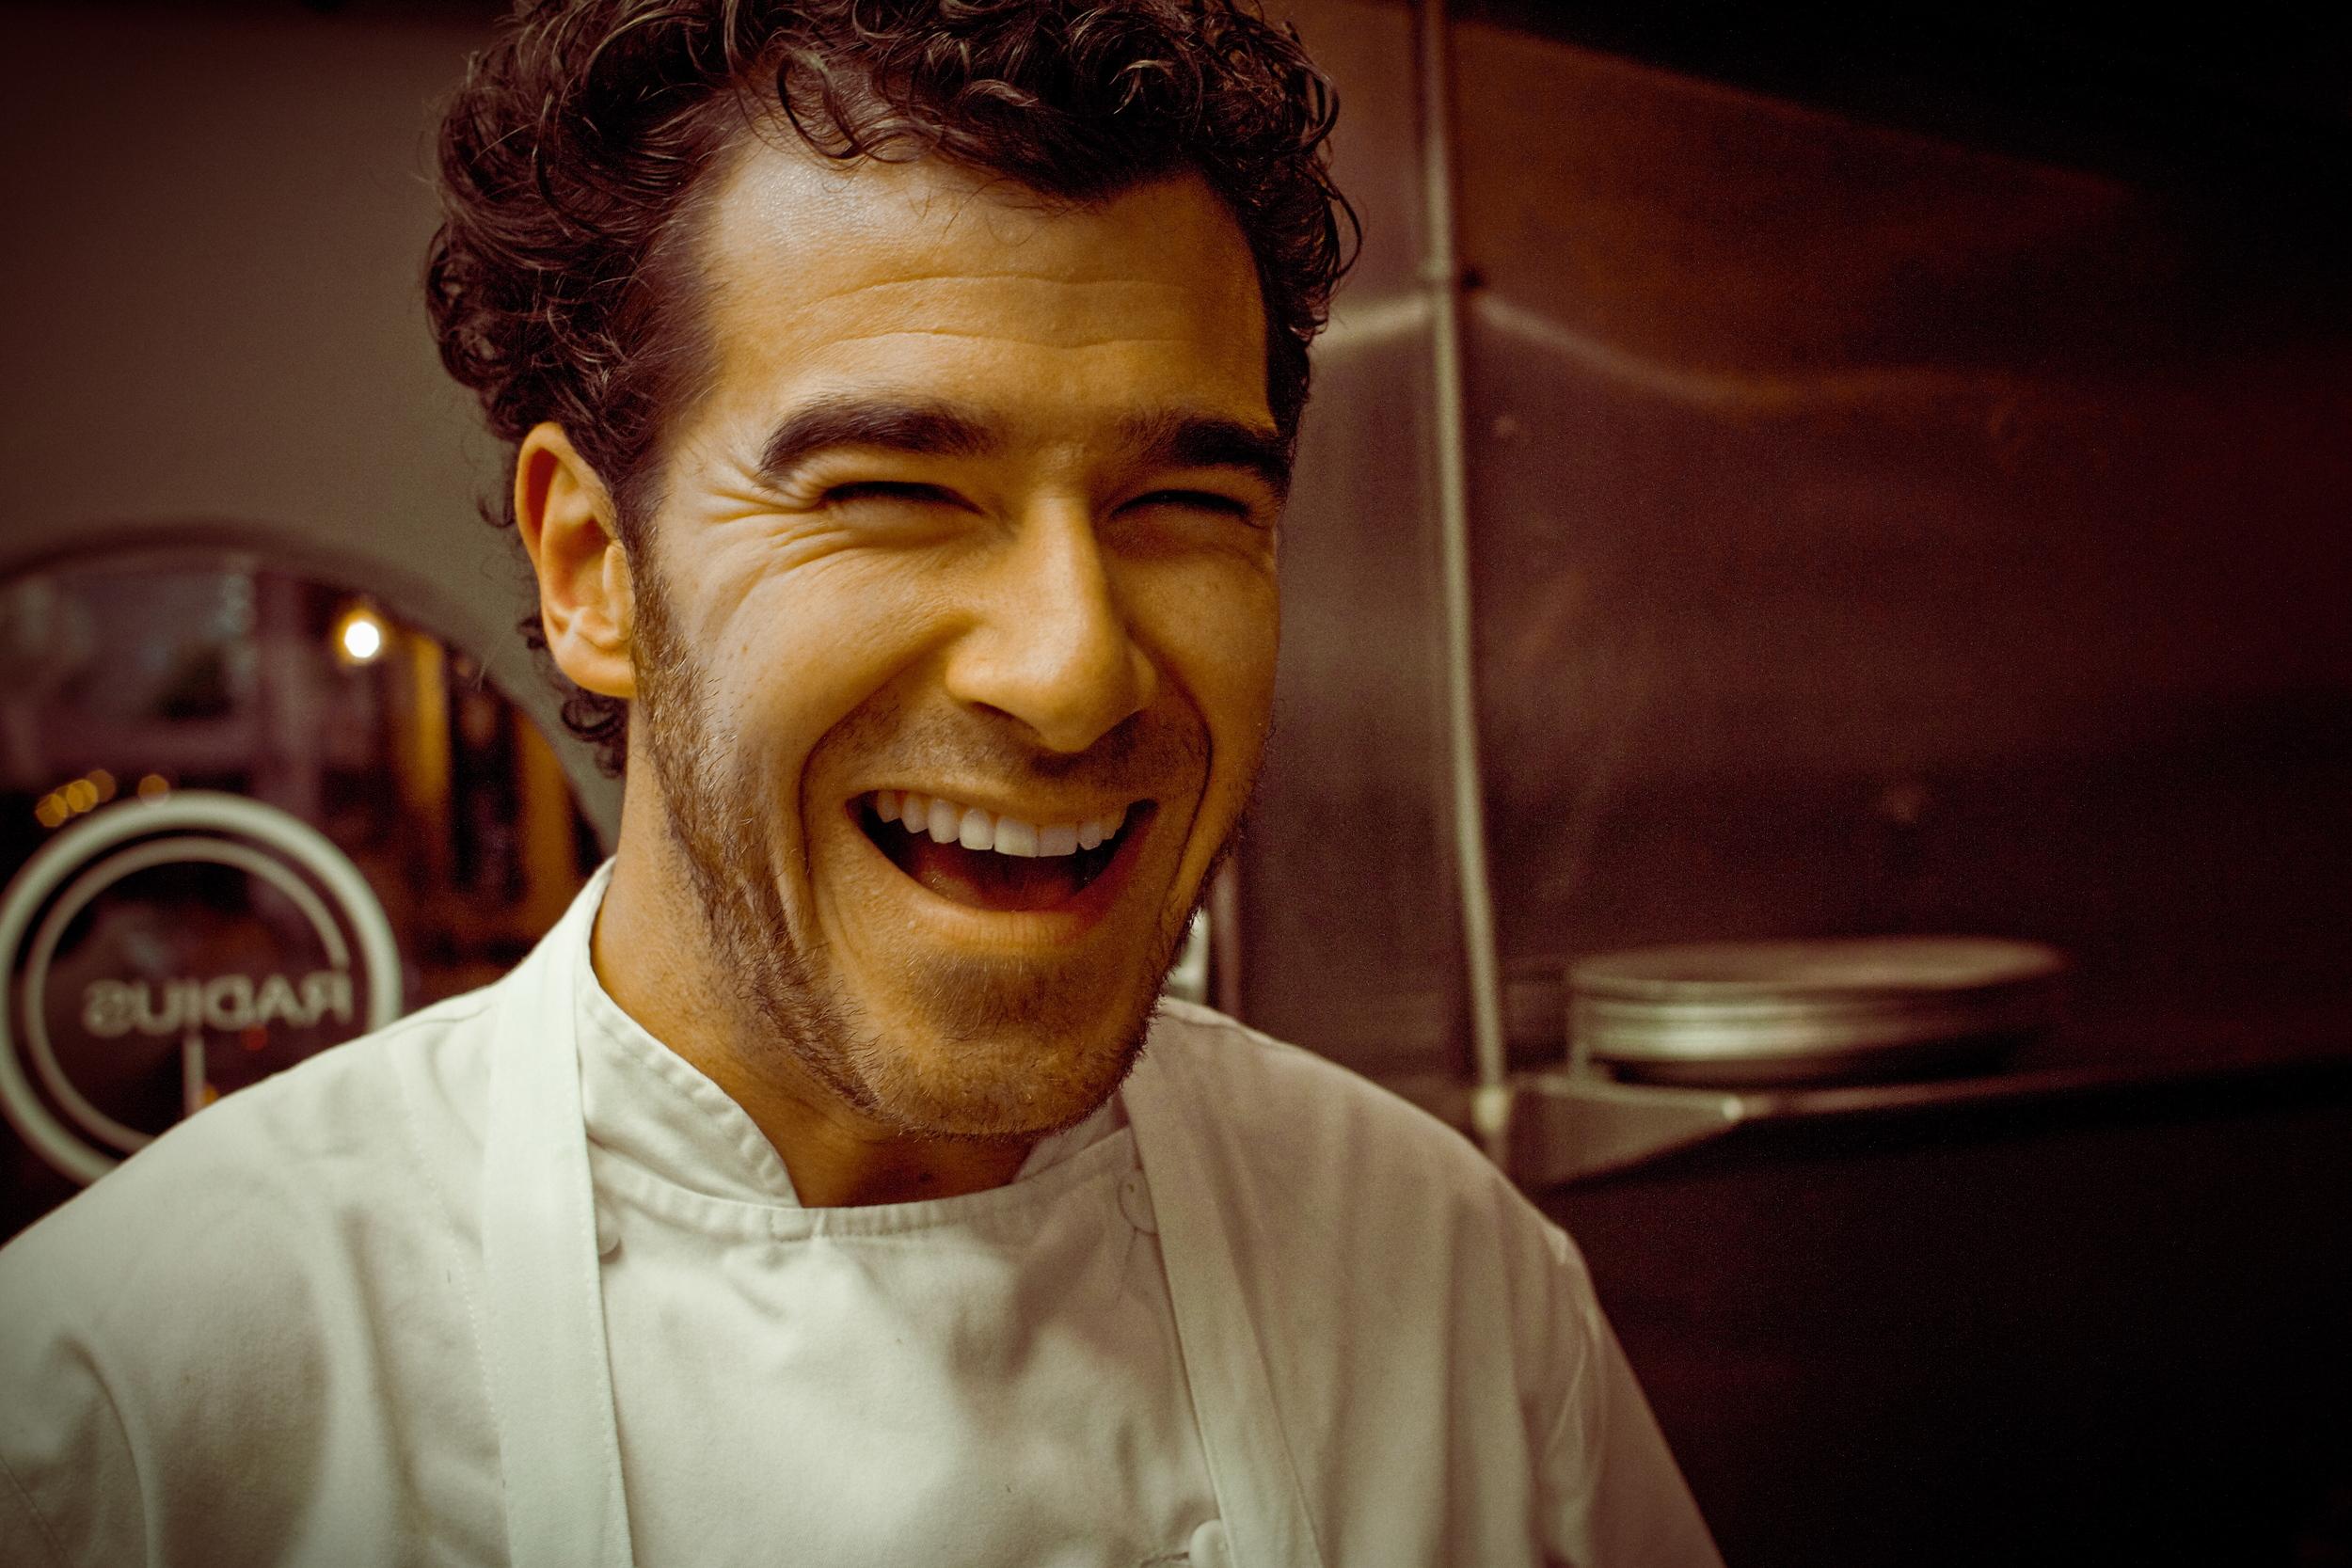 Chef Nicolas Borzee